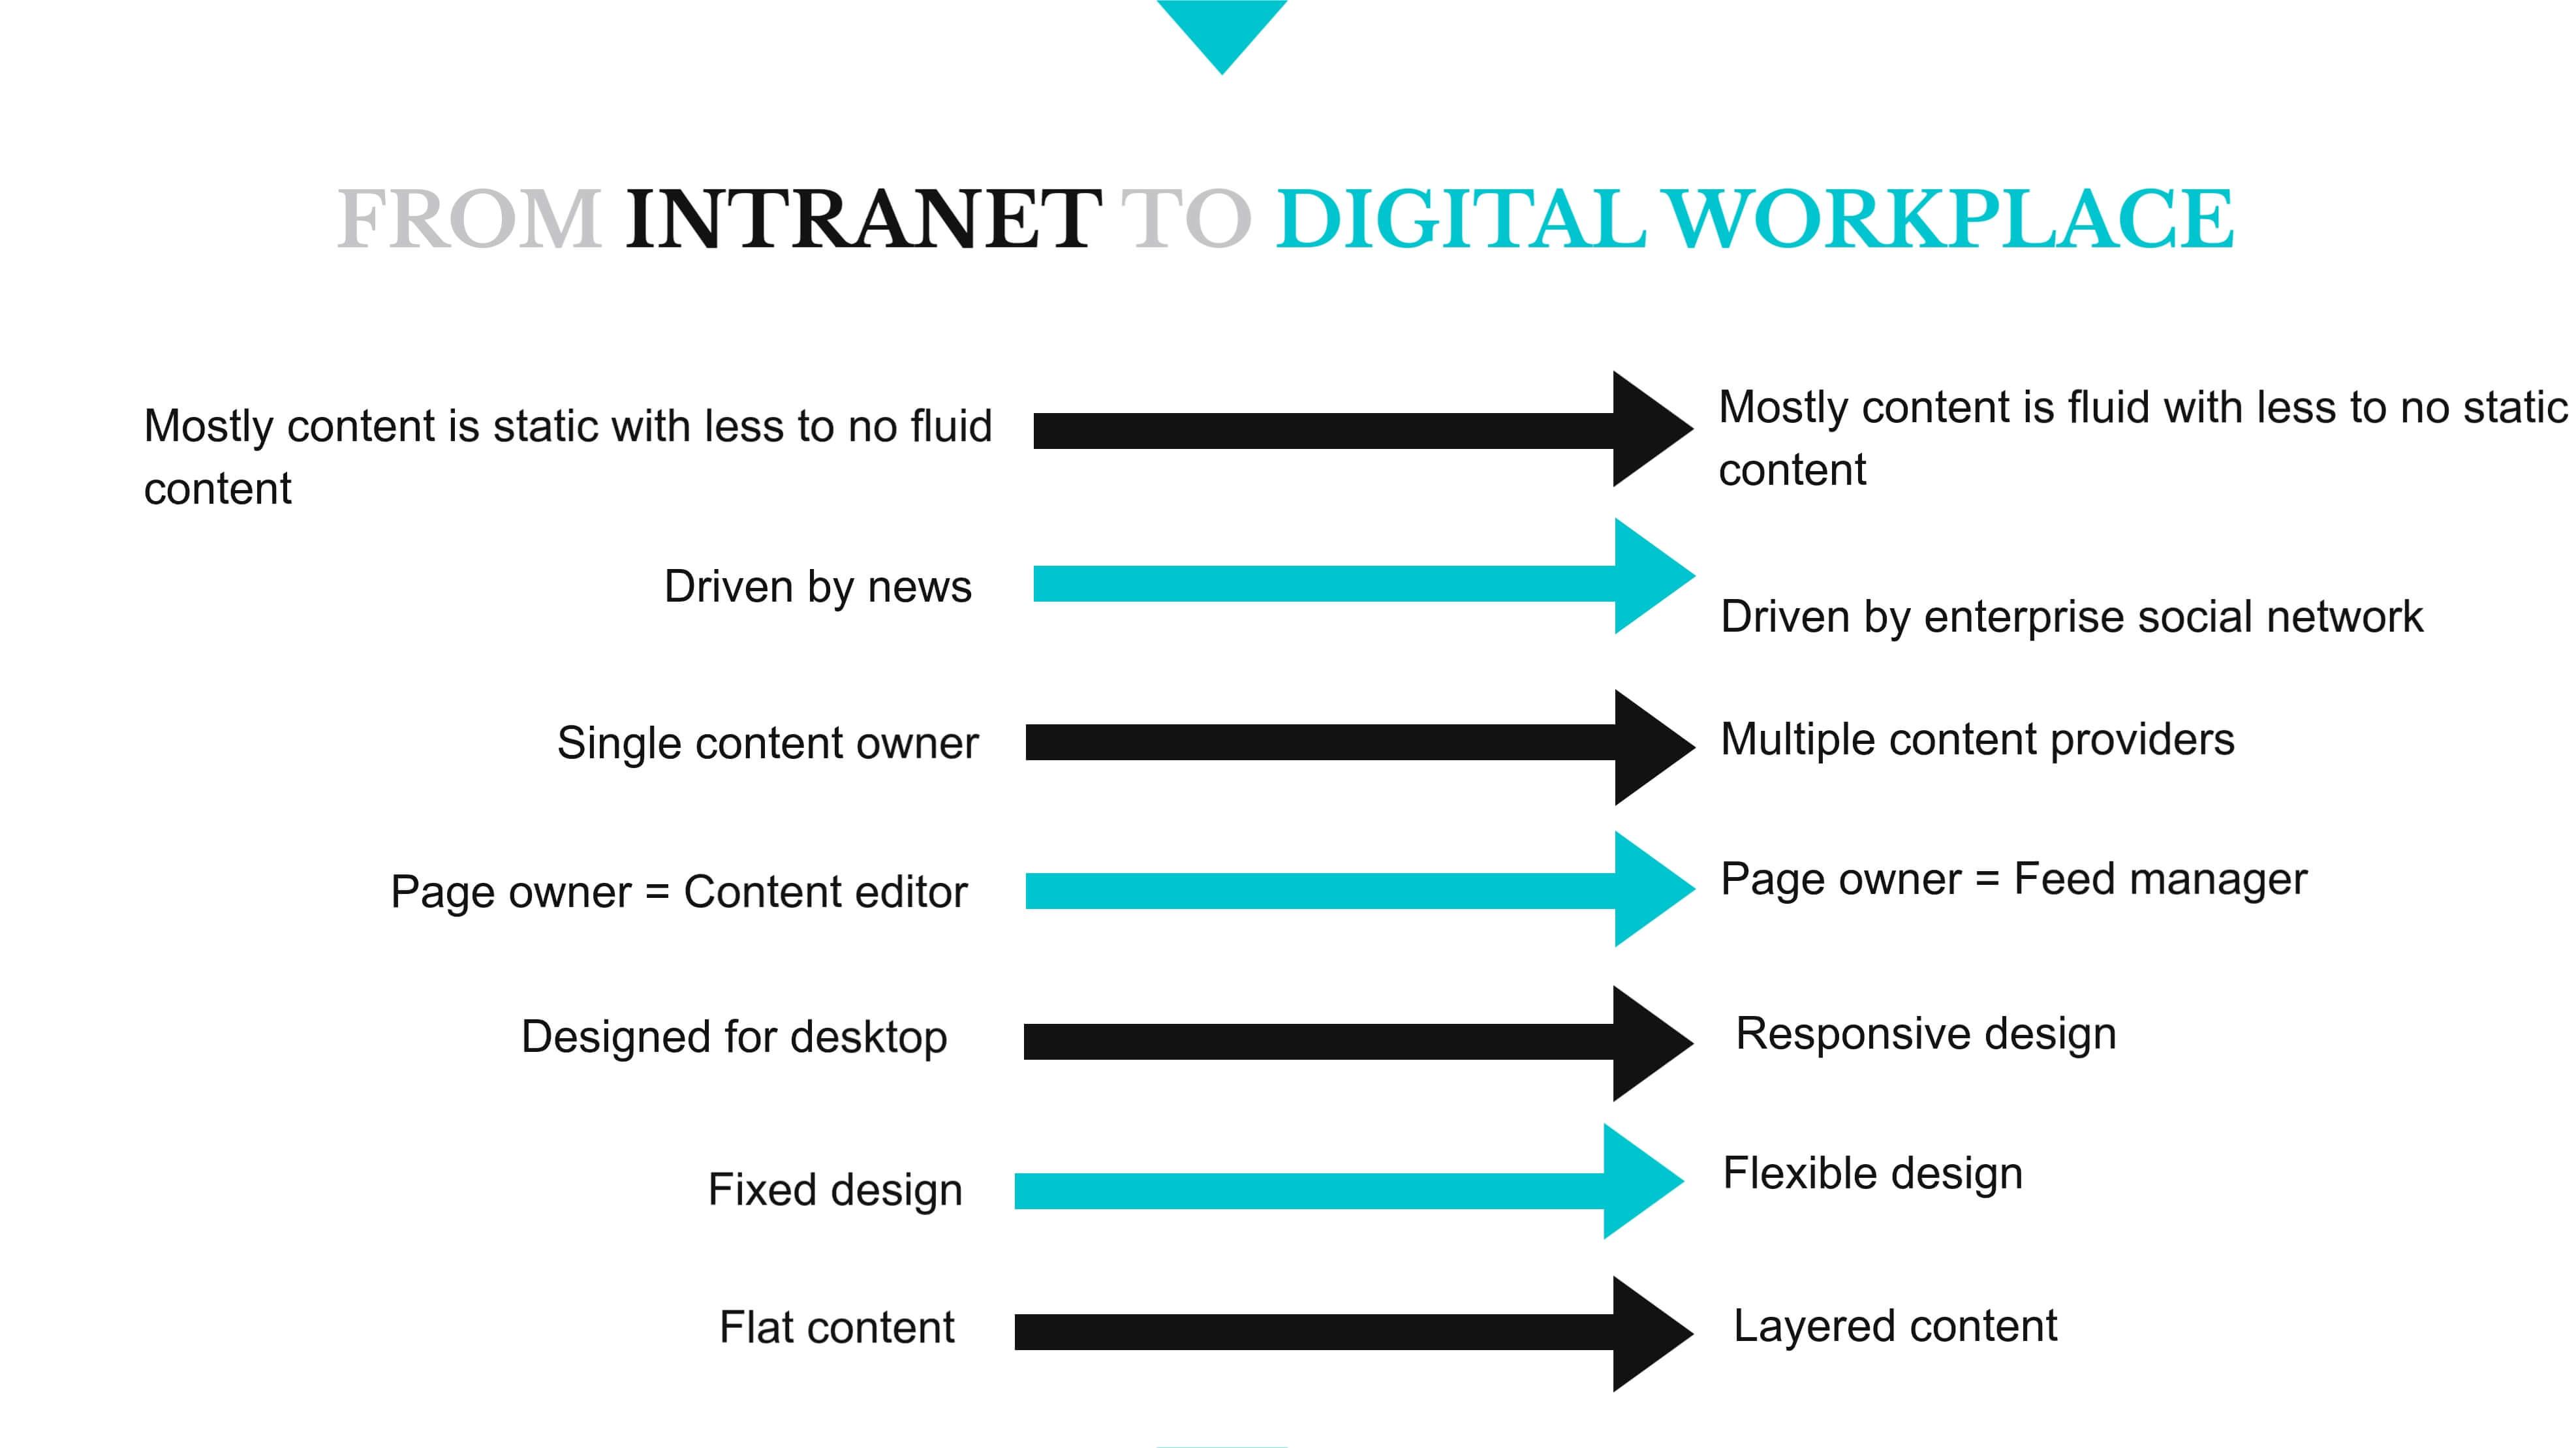 intranet platform to digital workplace